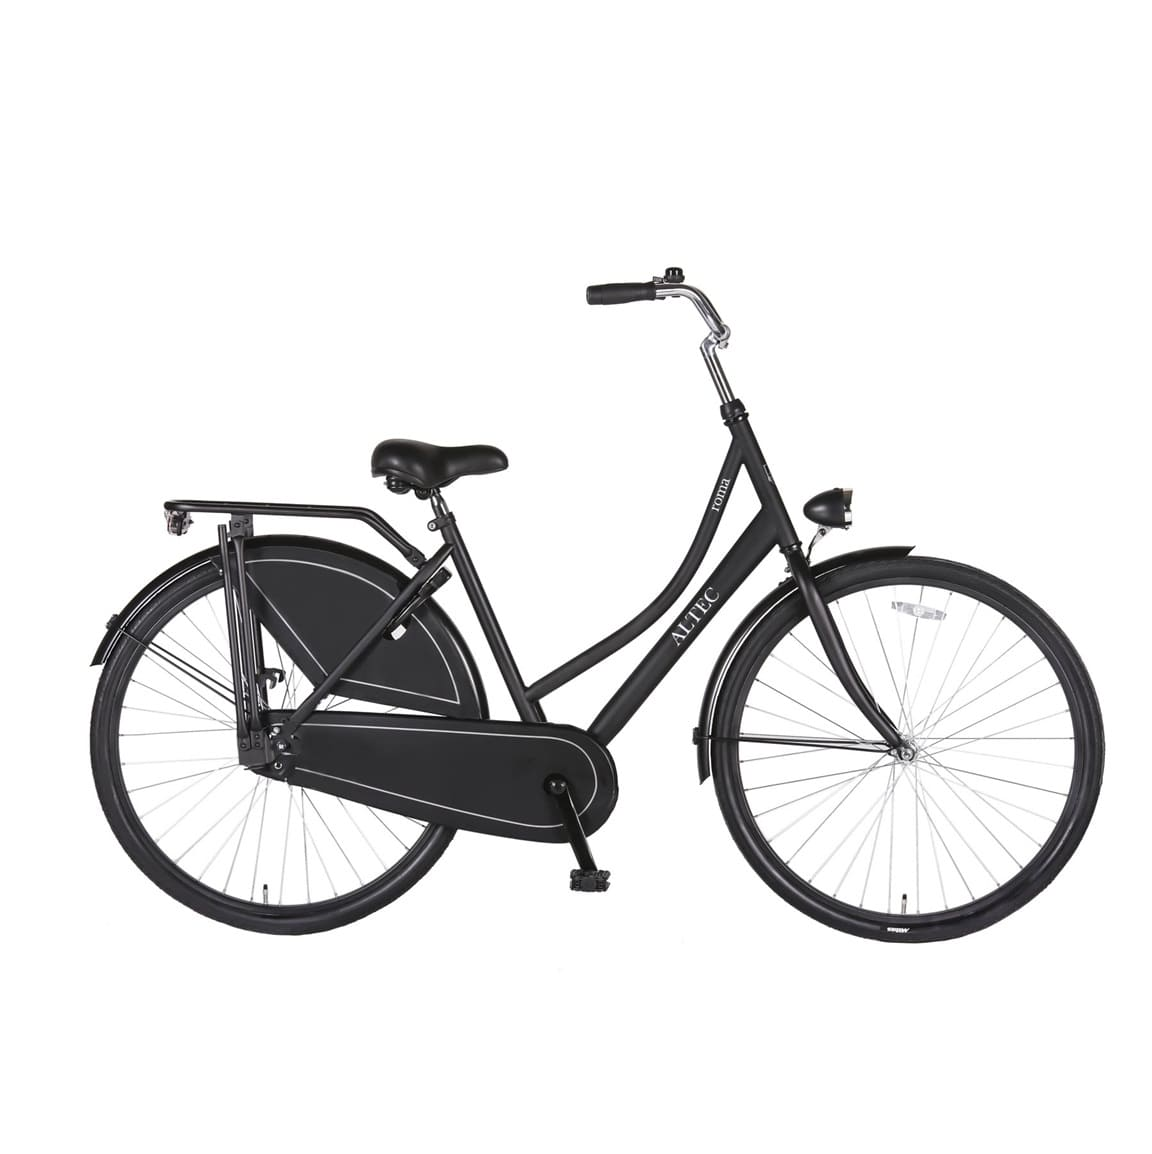 Altec-Roma-28-inch-Omafiets-Zwart-2019-min.jpg